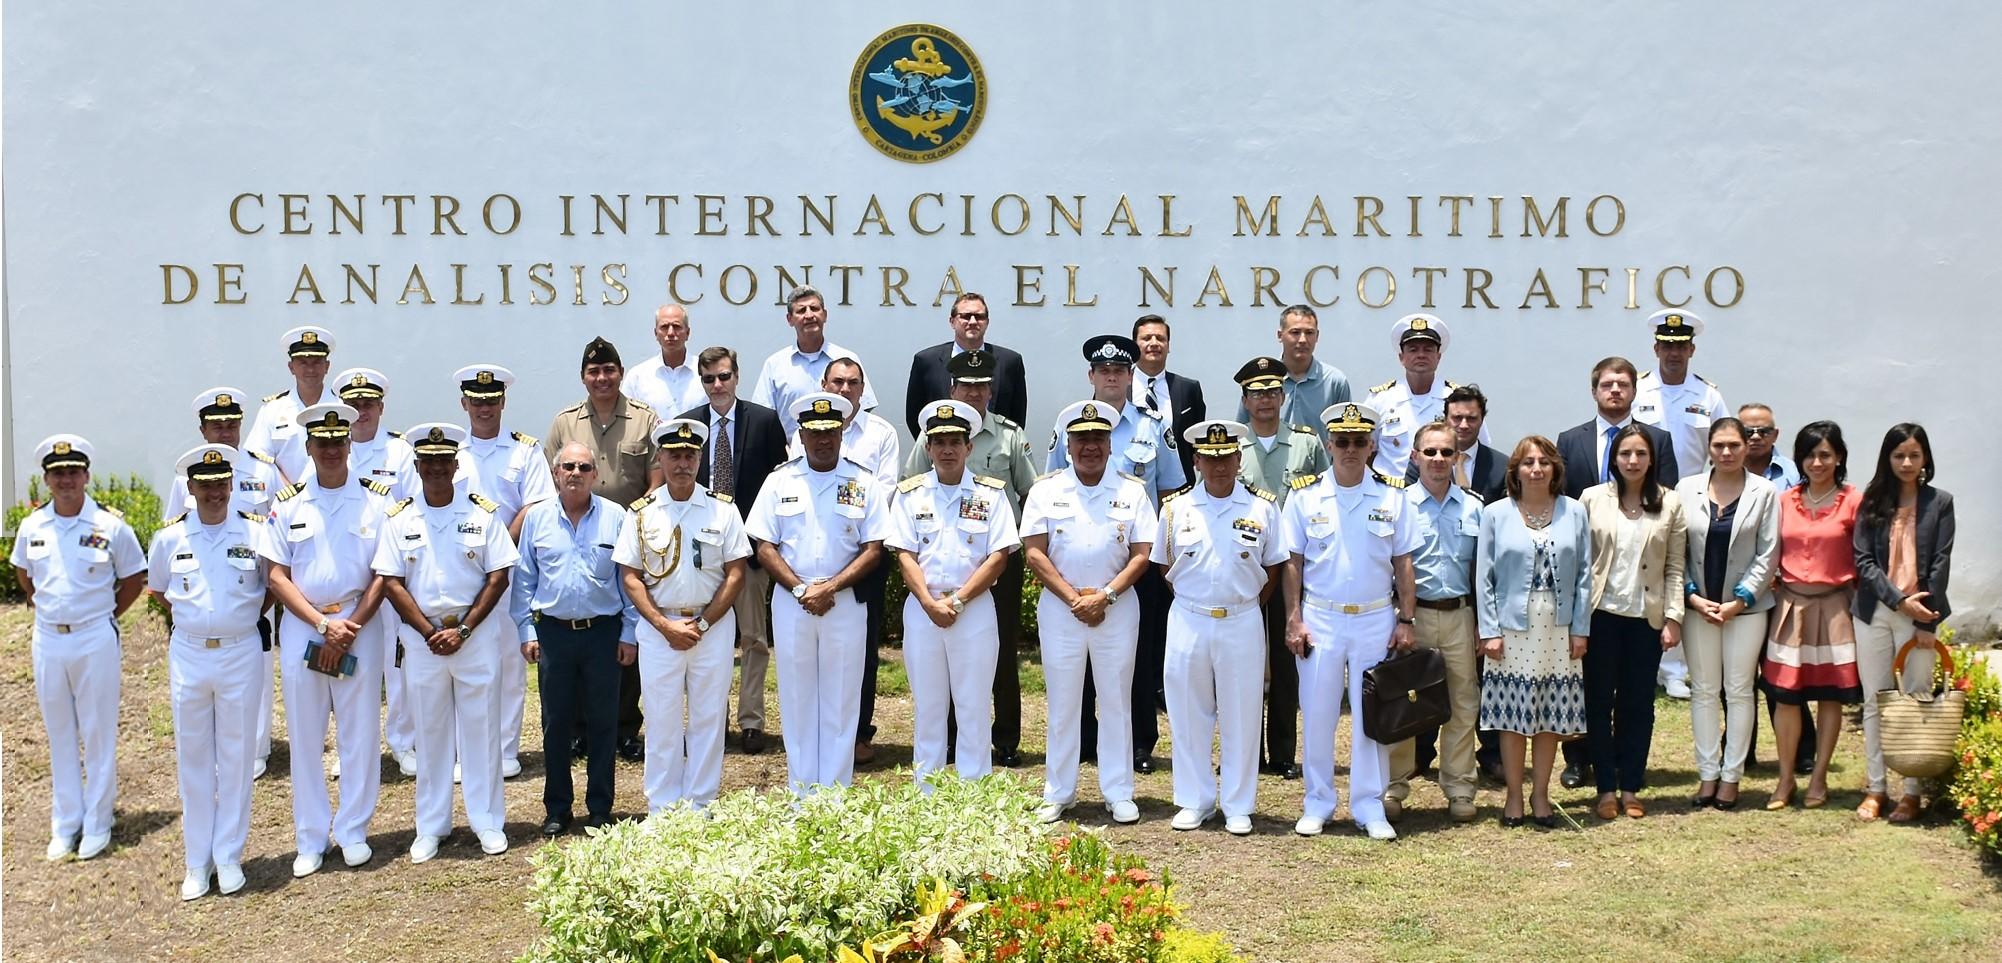 Colombian Navy's International Maritime Center against Drug Trafficking: A Strategic Anti-Drug Solution